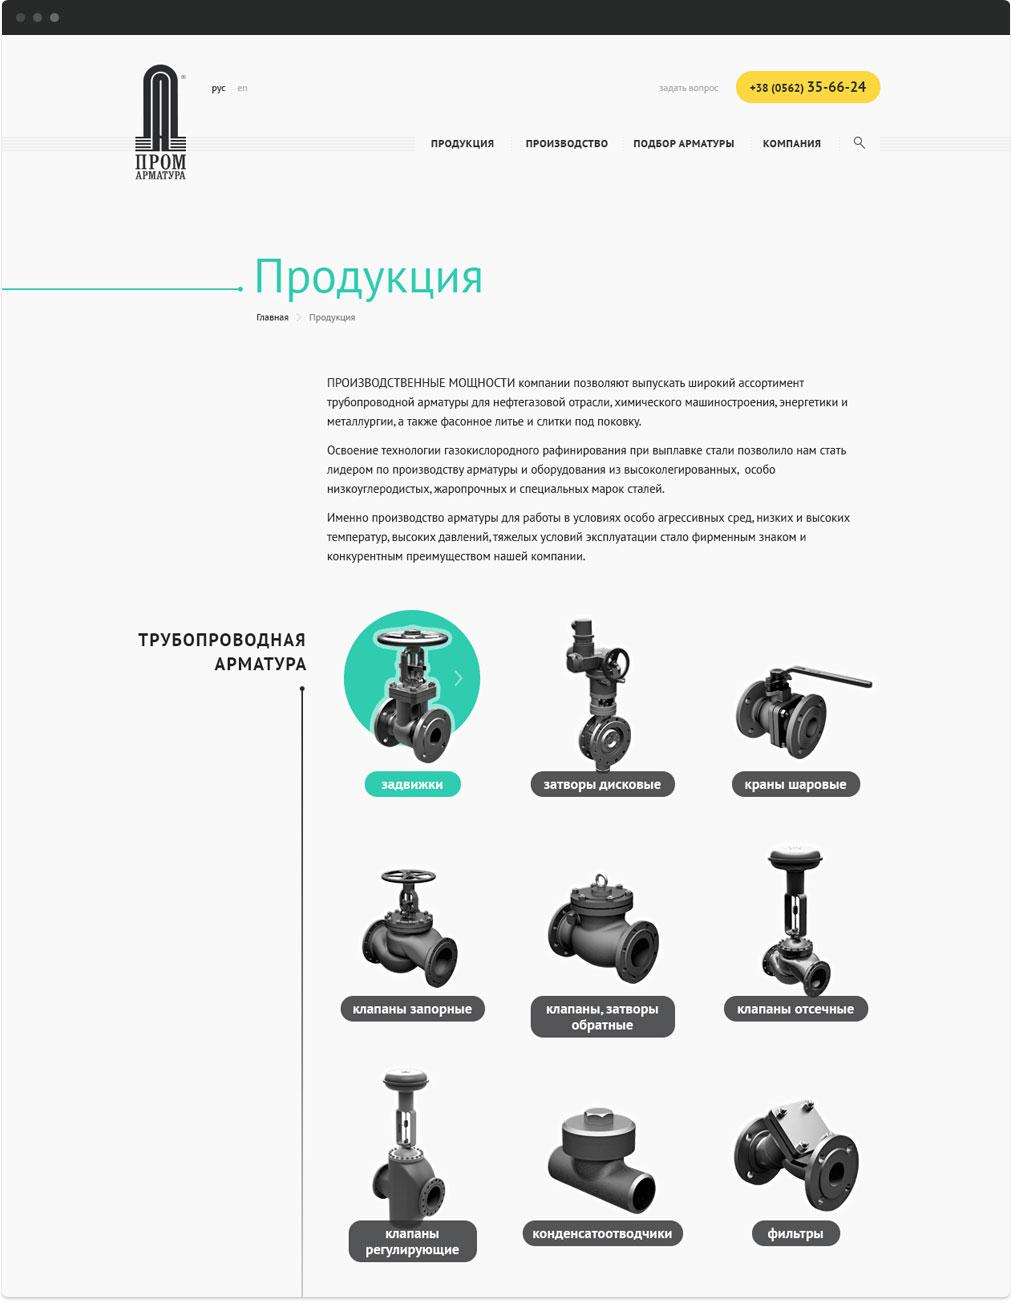 promarmatura-site-2